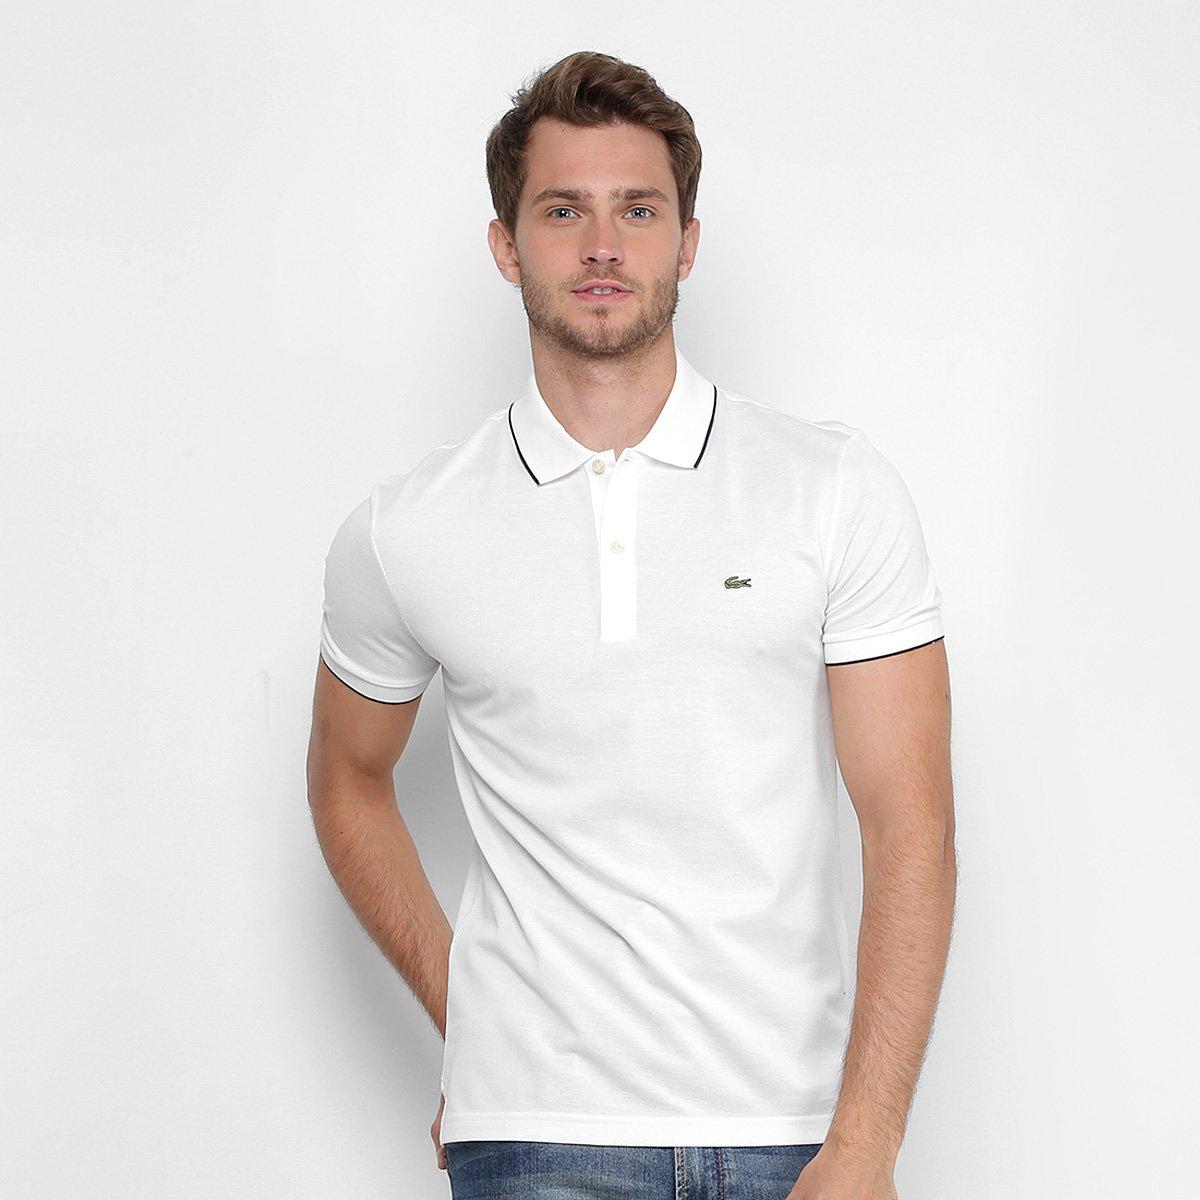 934491b7eb1c3 Camisa Polo Lacoste Piquet Slim Masculina - Compre Agora